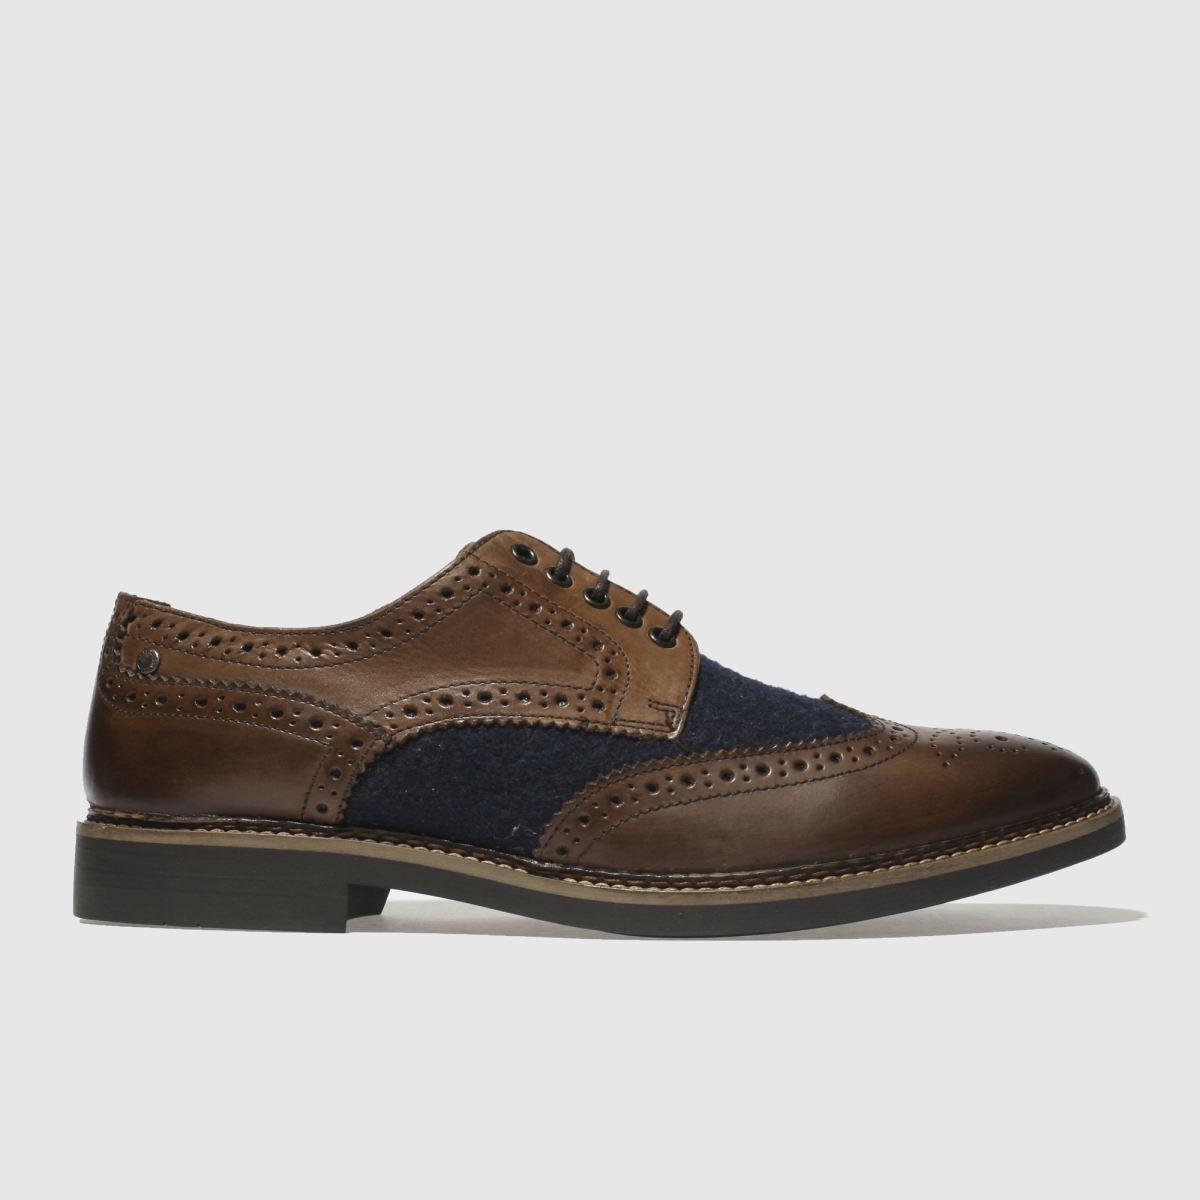 Base London Brown & Navy Rothko Shoes